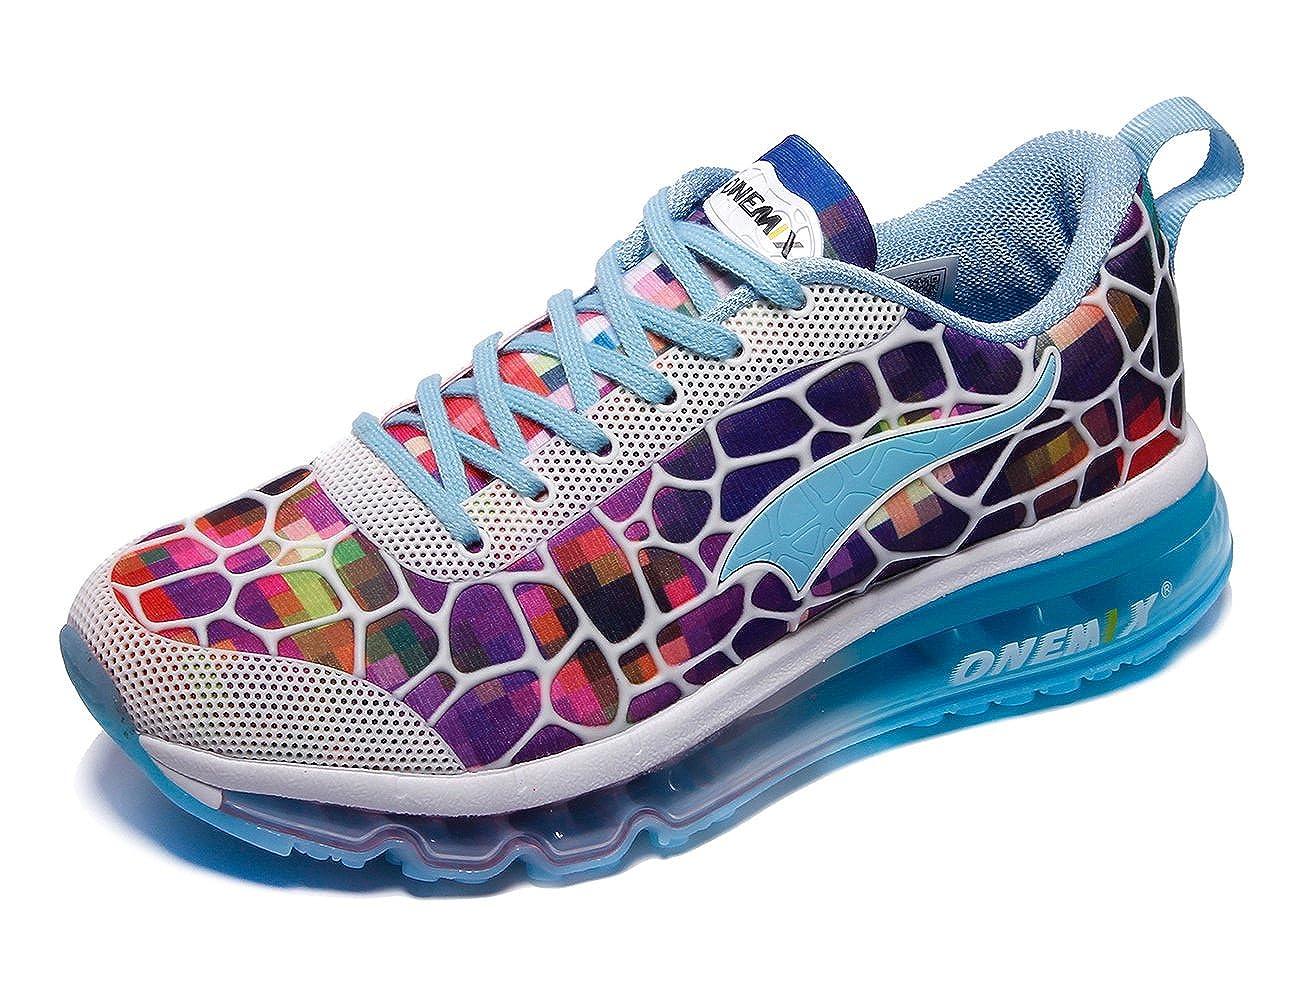 70bffbb02244 ONEMIX Women s Air Cushiong Running Shoes